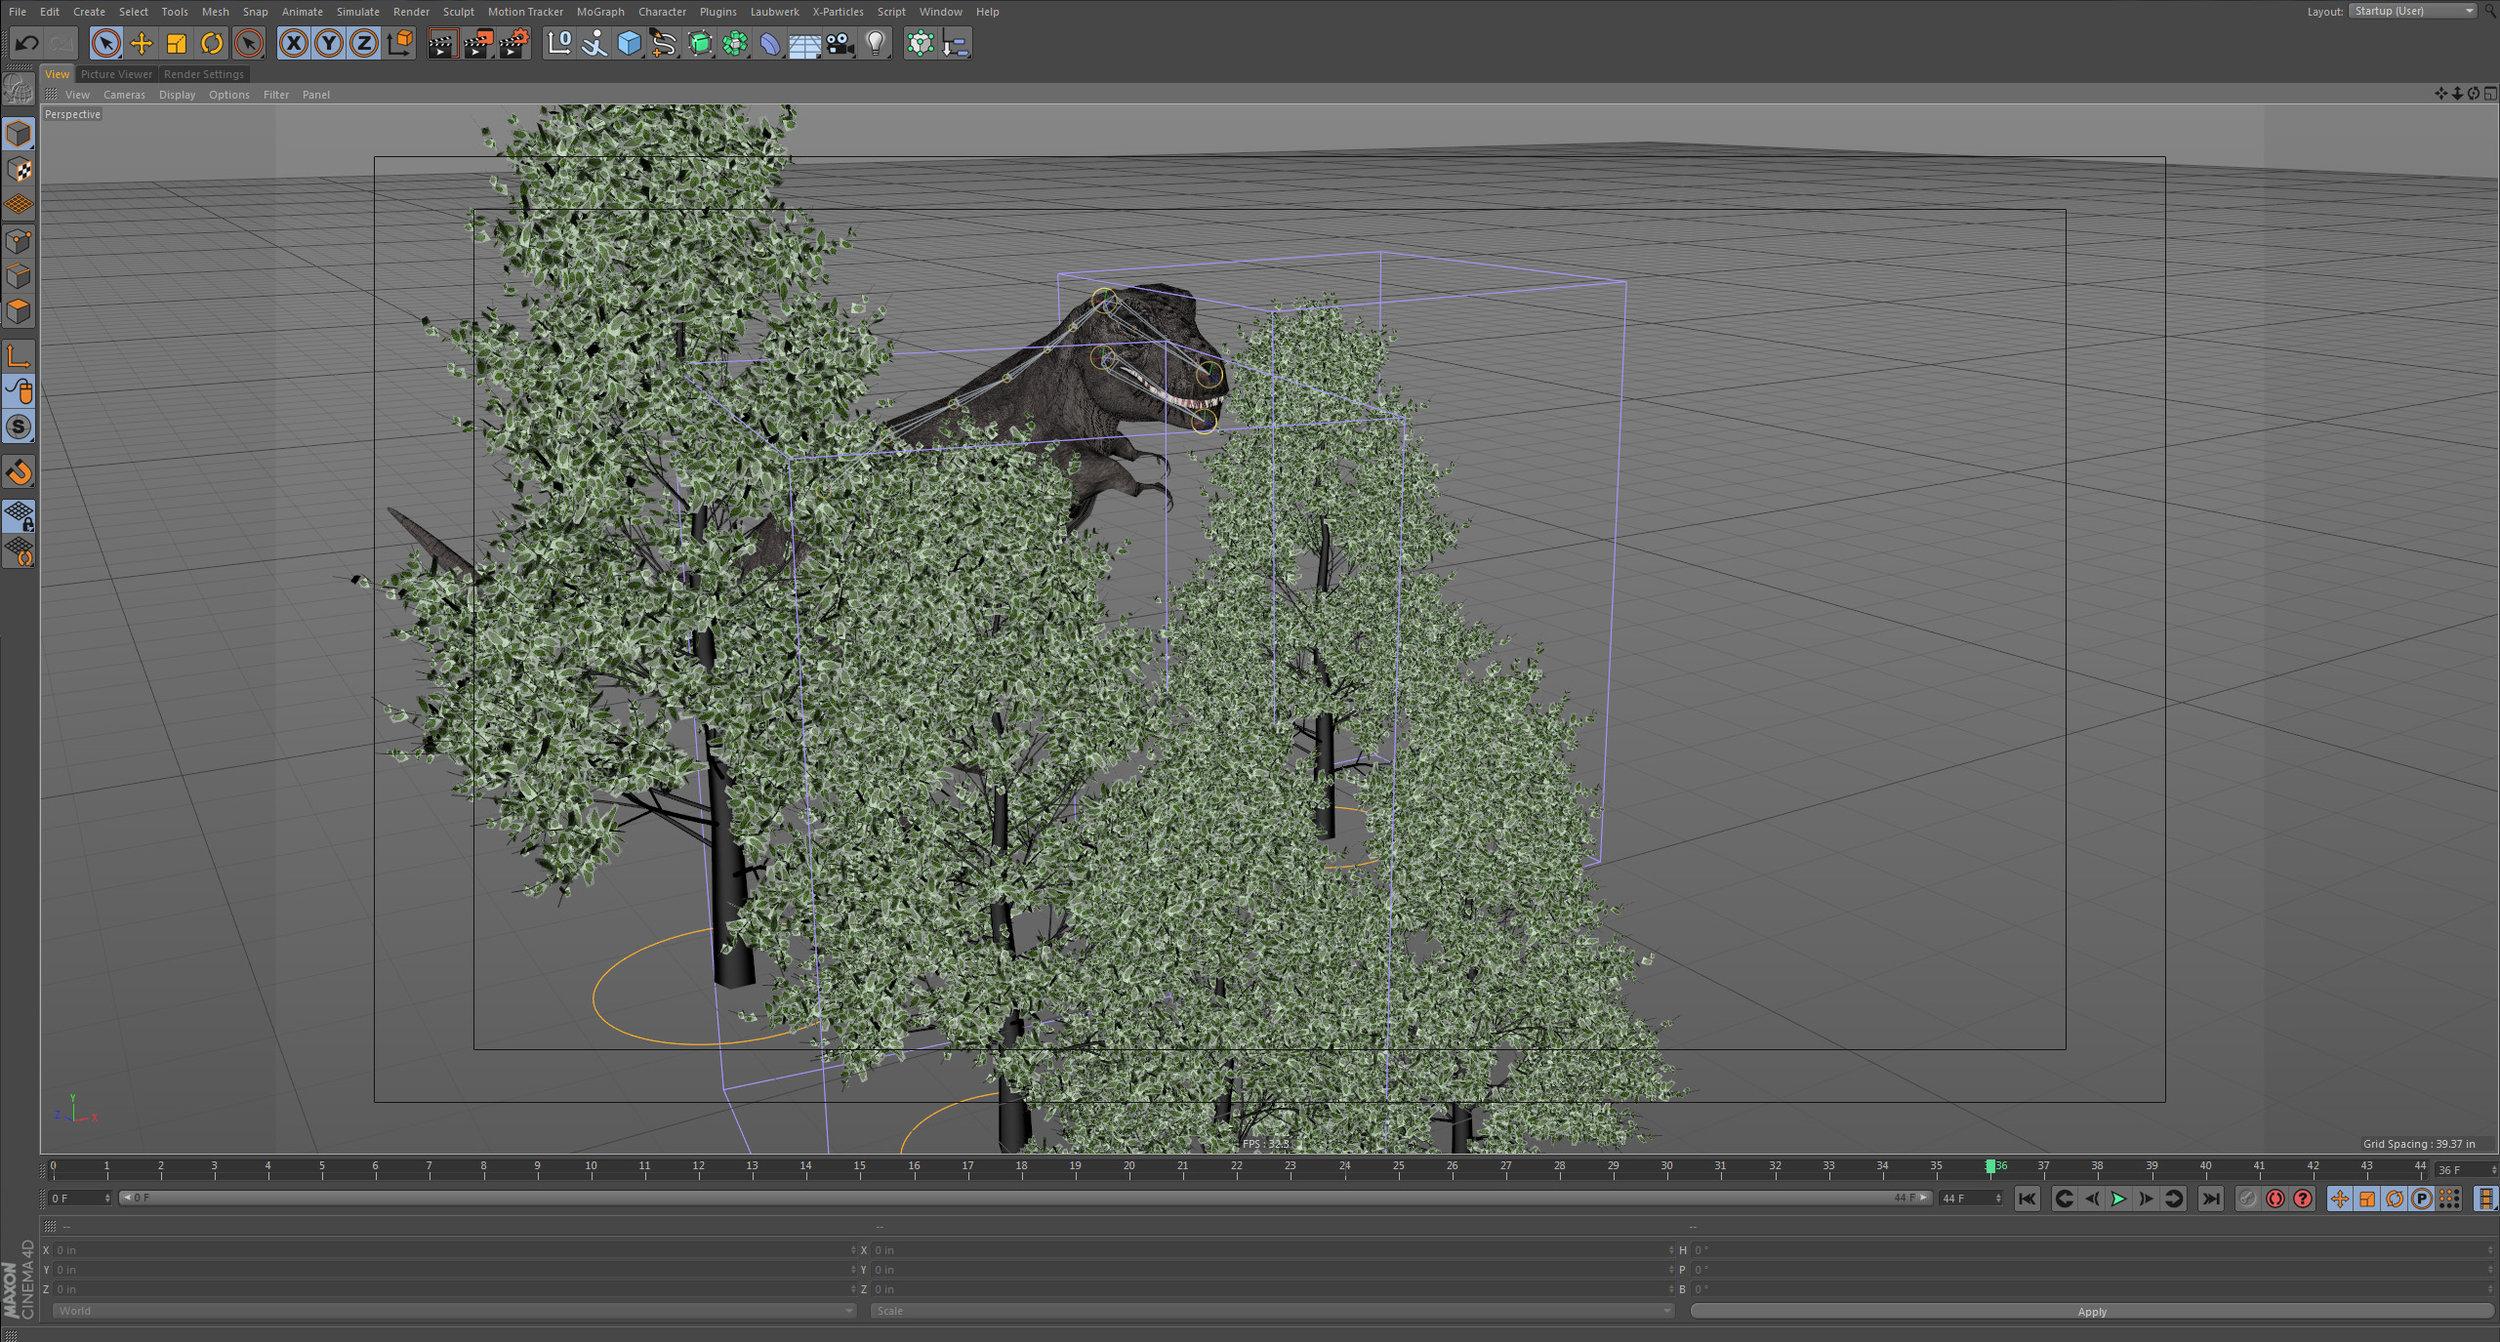 TH_Trex Trees.jpg